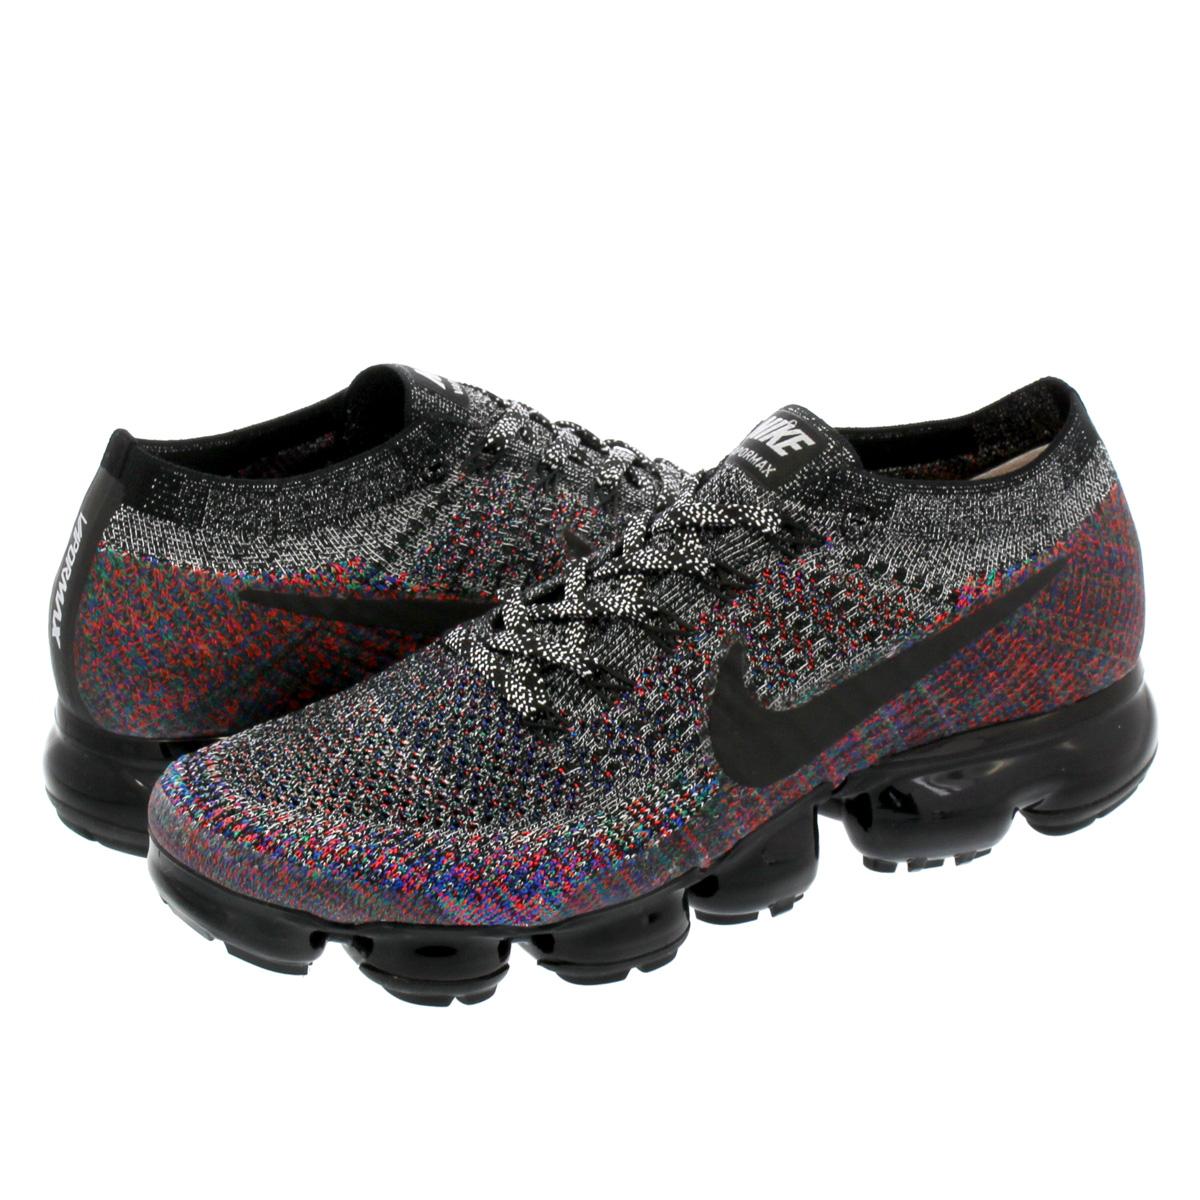 best value 8558e c2e14 NIKE AIR VAPORMAX FLYKNIT CNY Nike vapor max fried food knit CNY  BLACK/MULTI COLOR